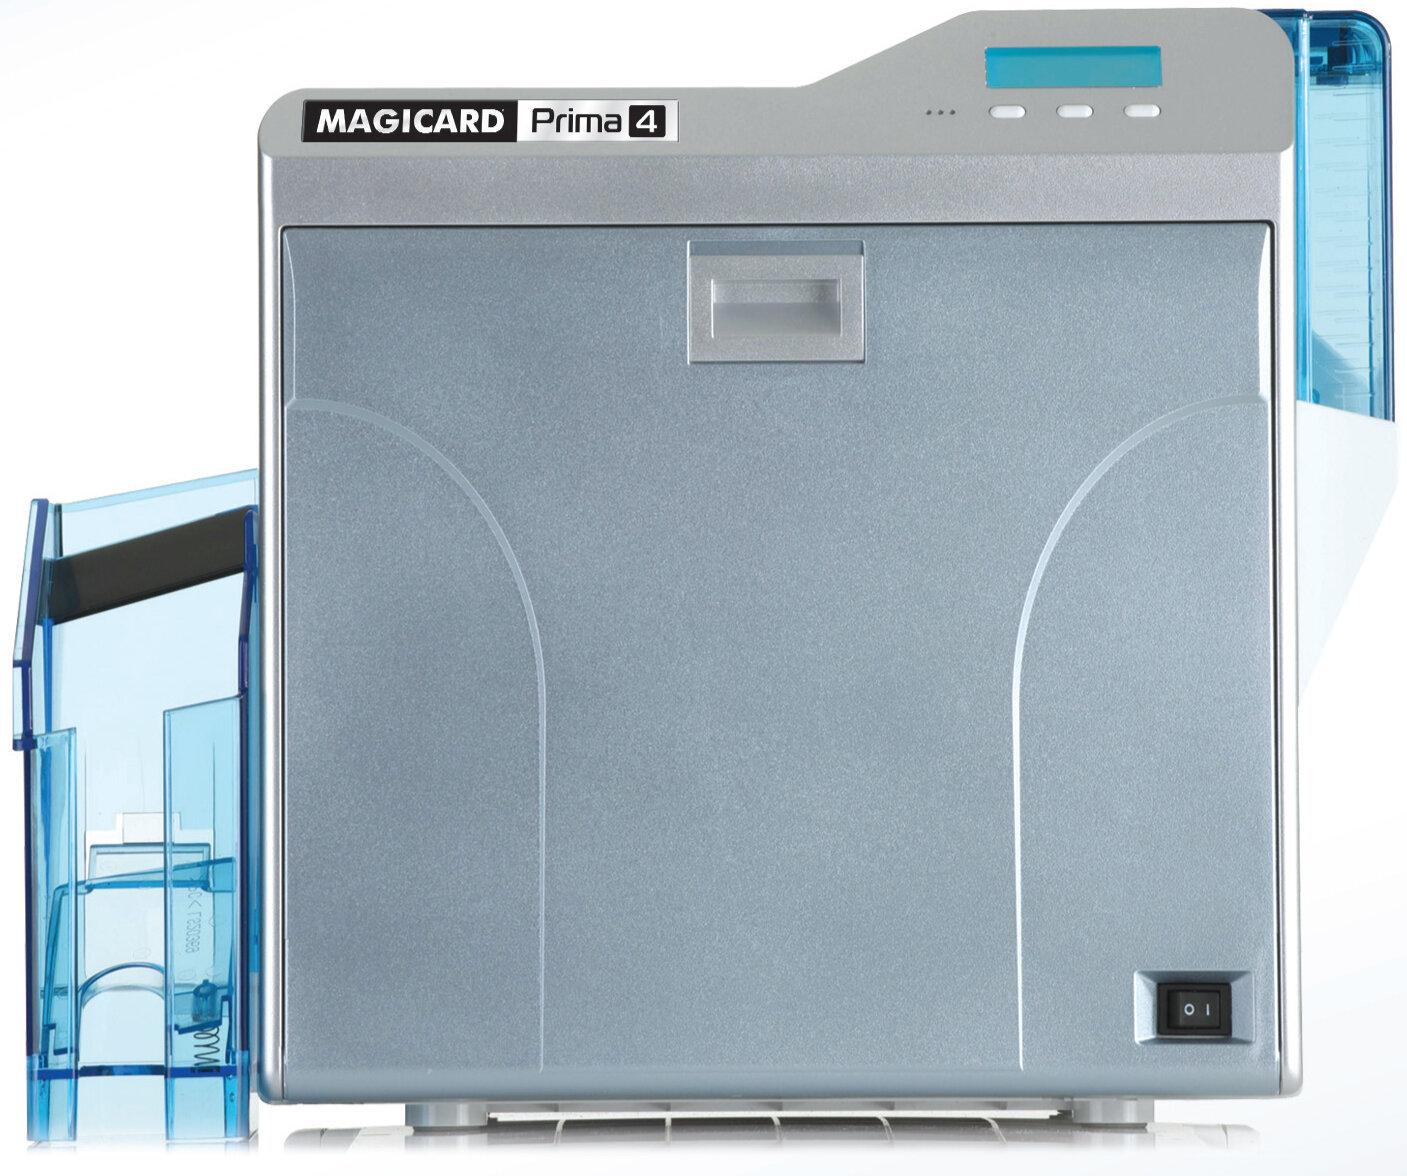 Карт-принтеры Magicard Prima 4 Duo